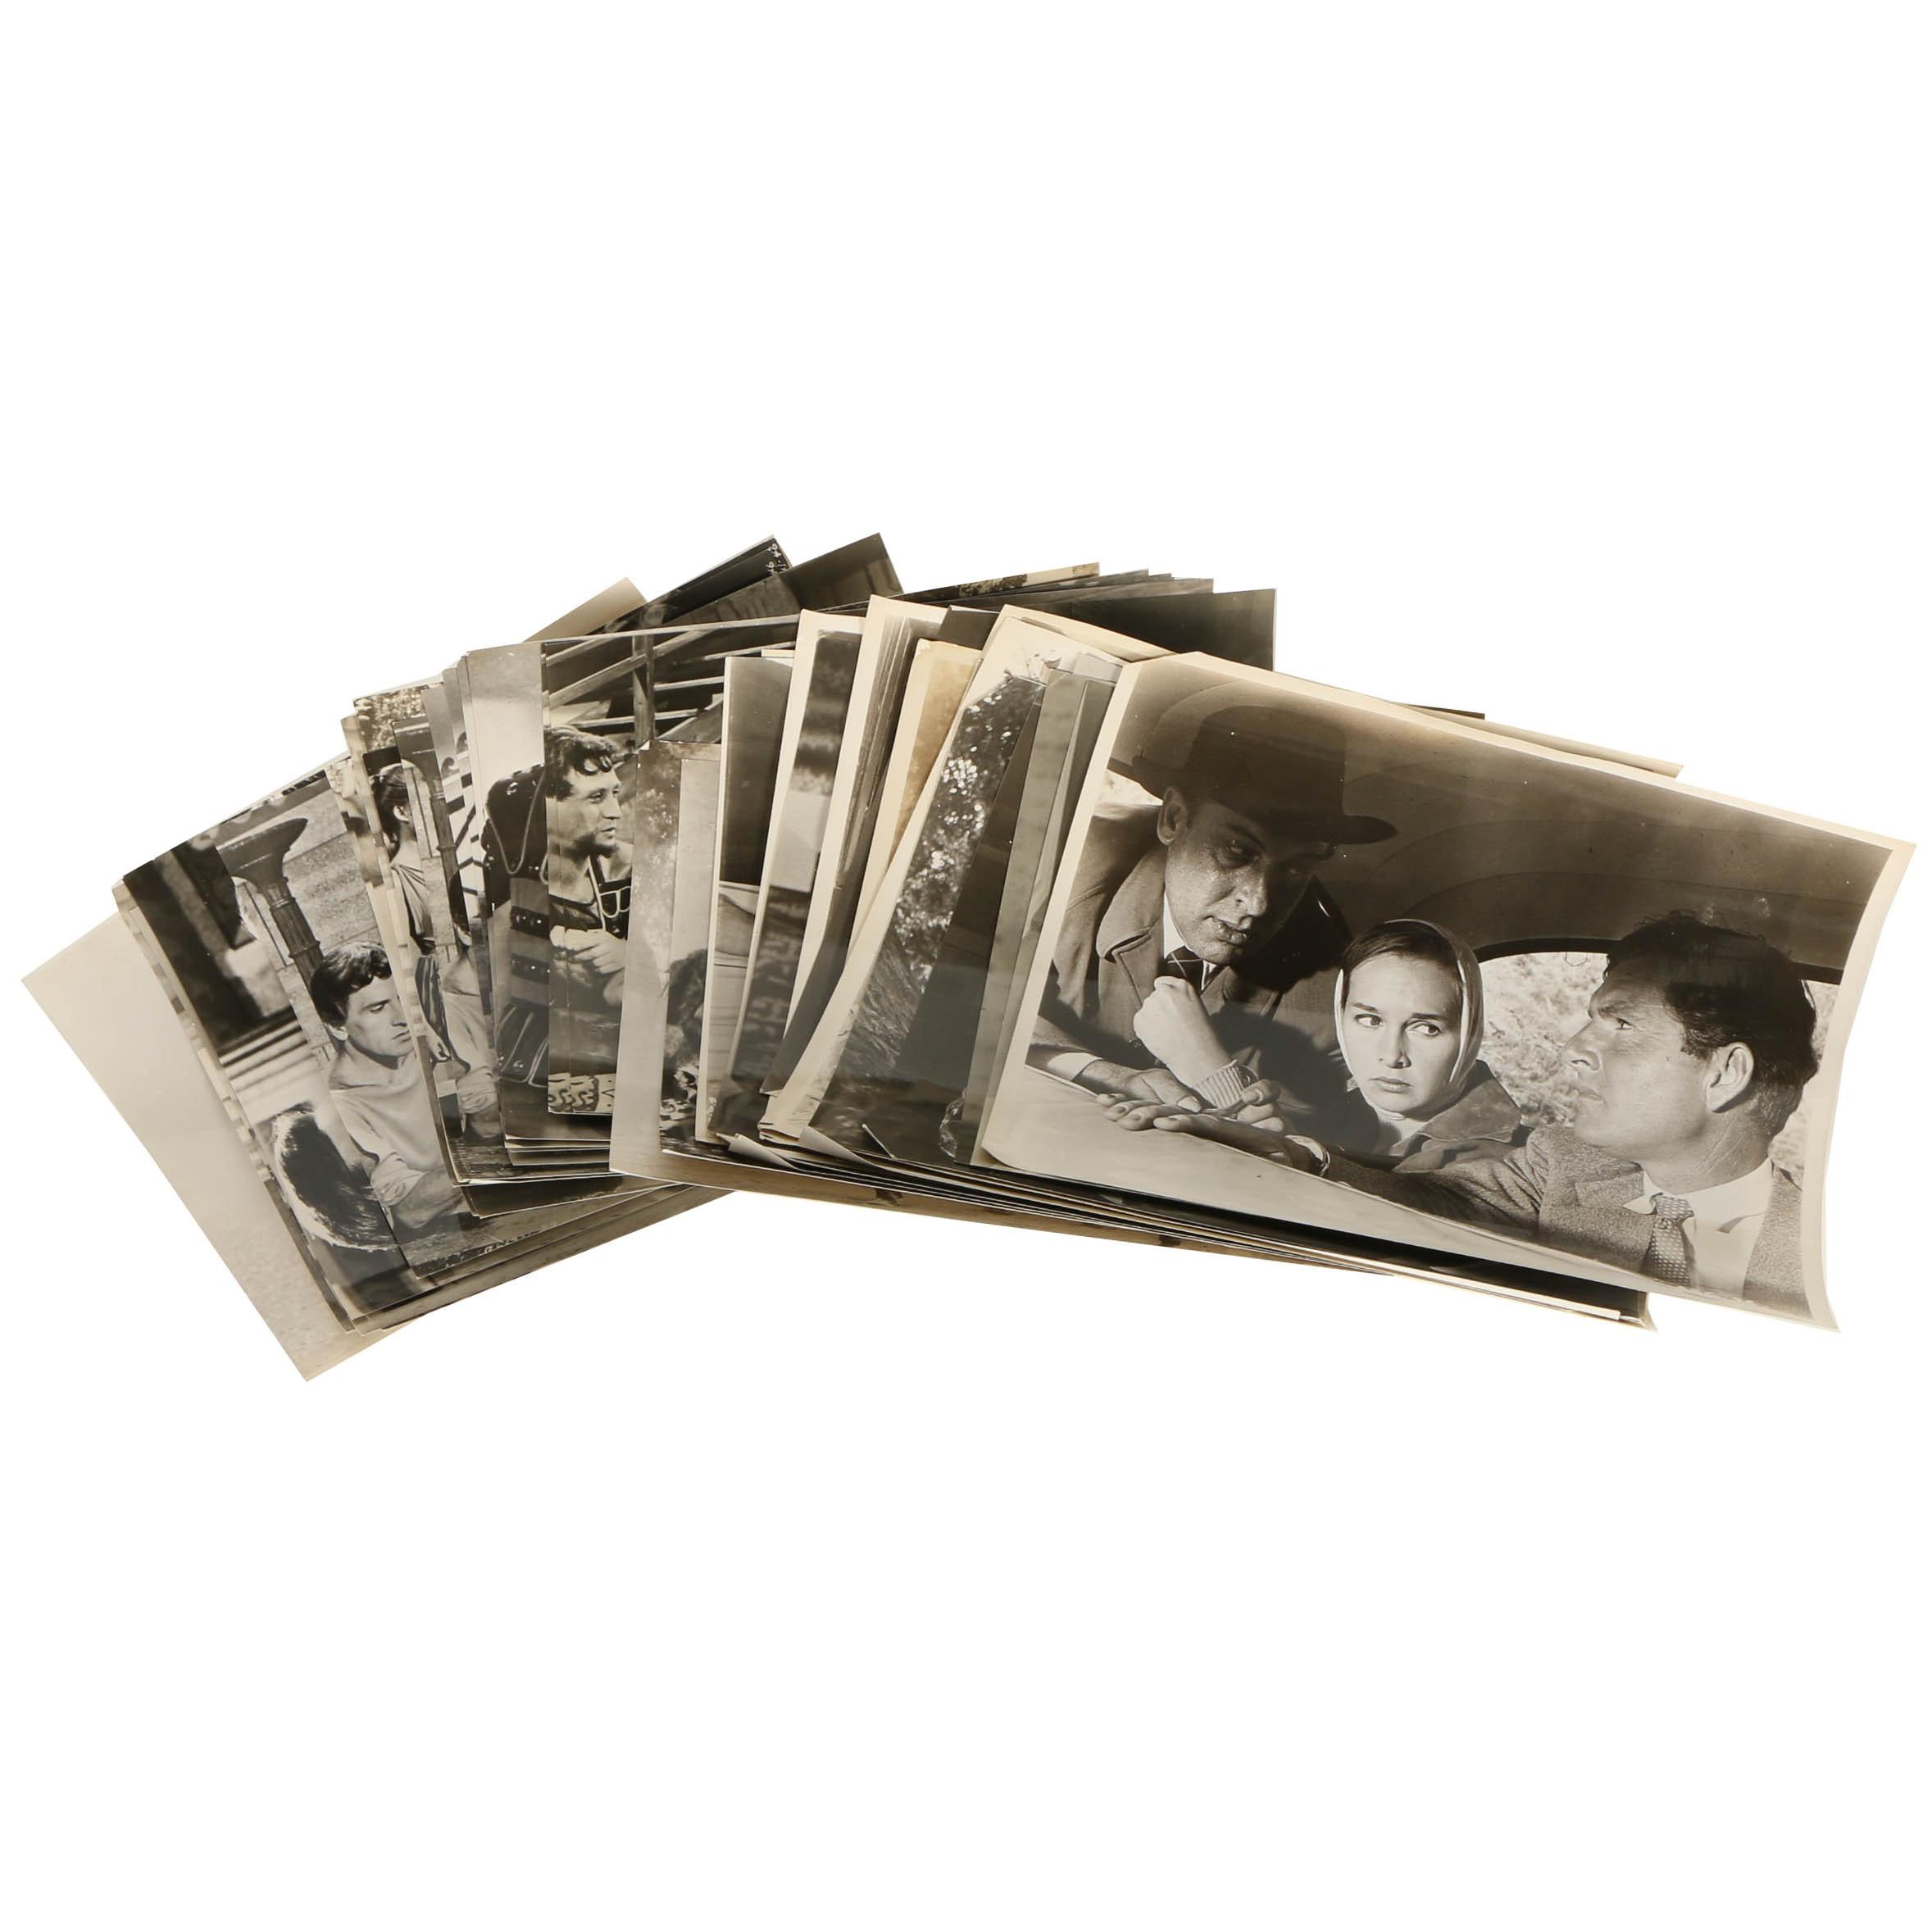 Mid 20th Century British Film and Celebrity Photographs